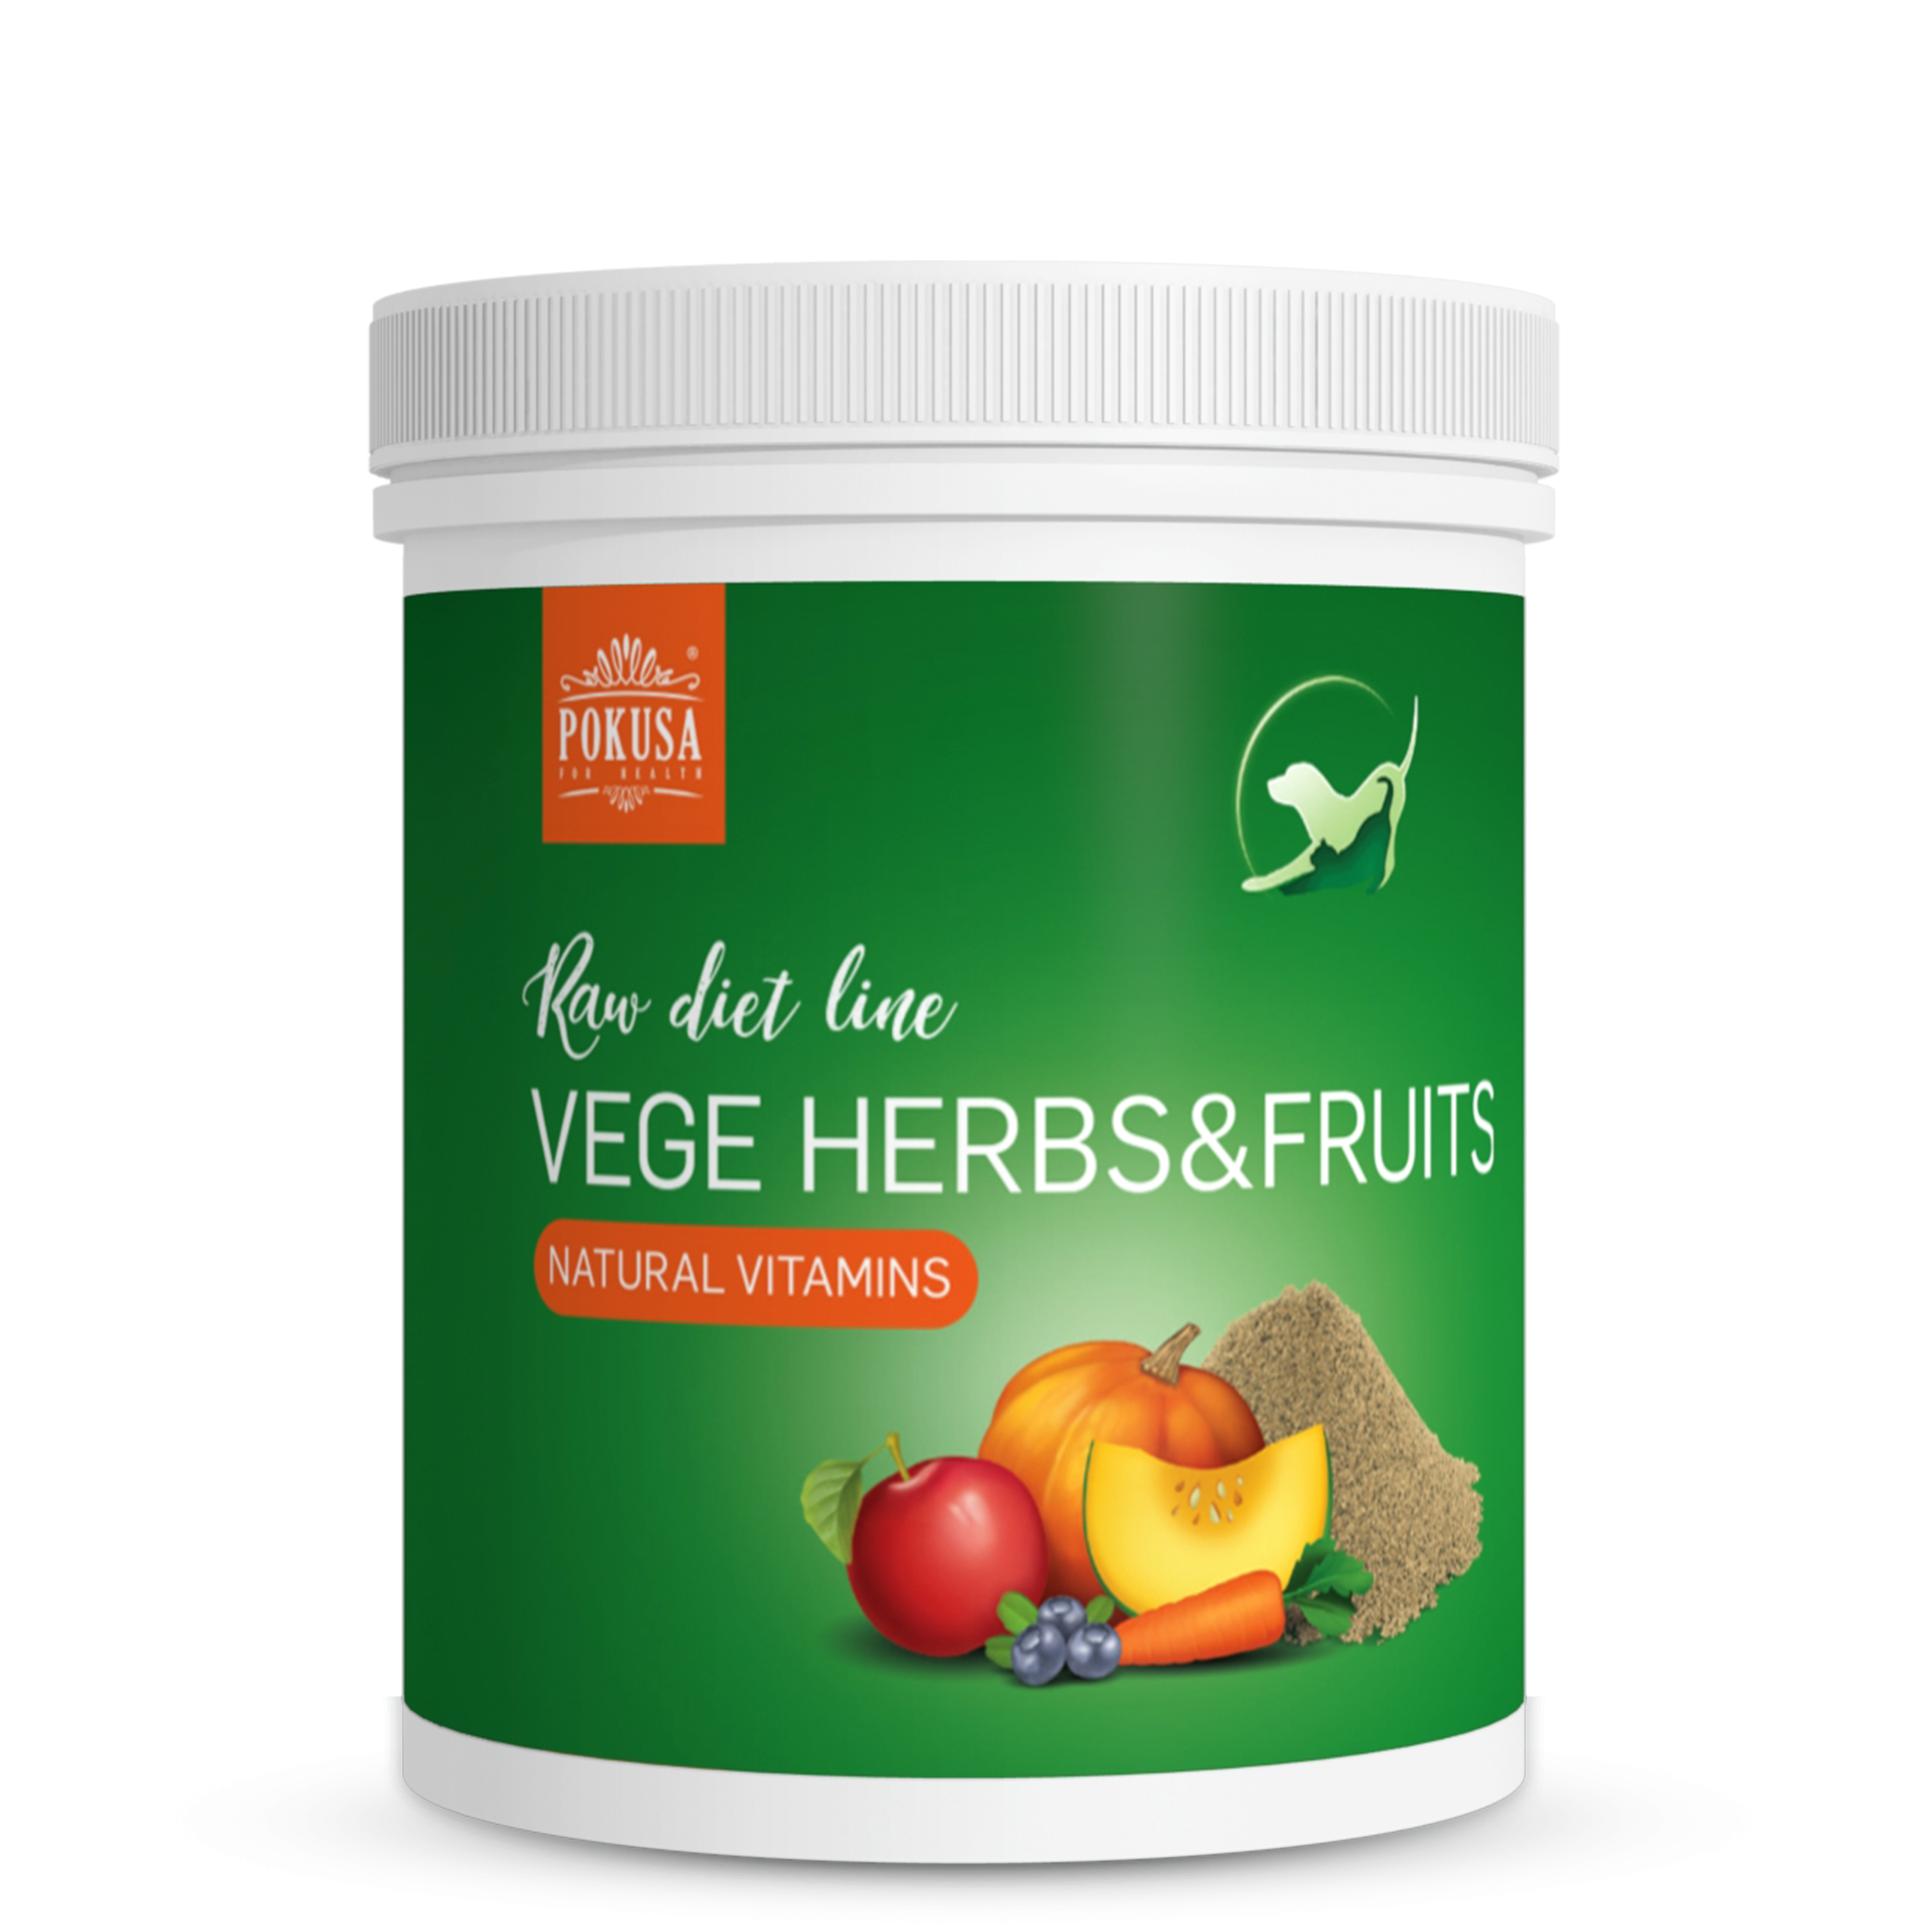 Pokusa RawDietLine VegeHerbs&Fruits 1000g